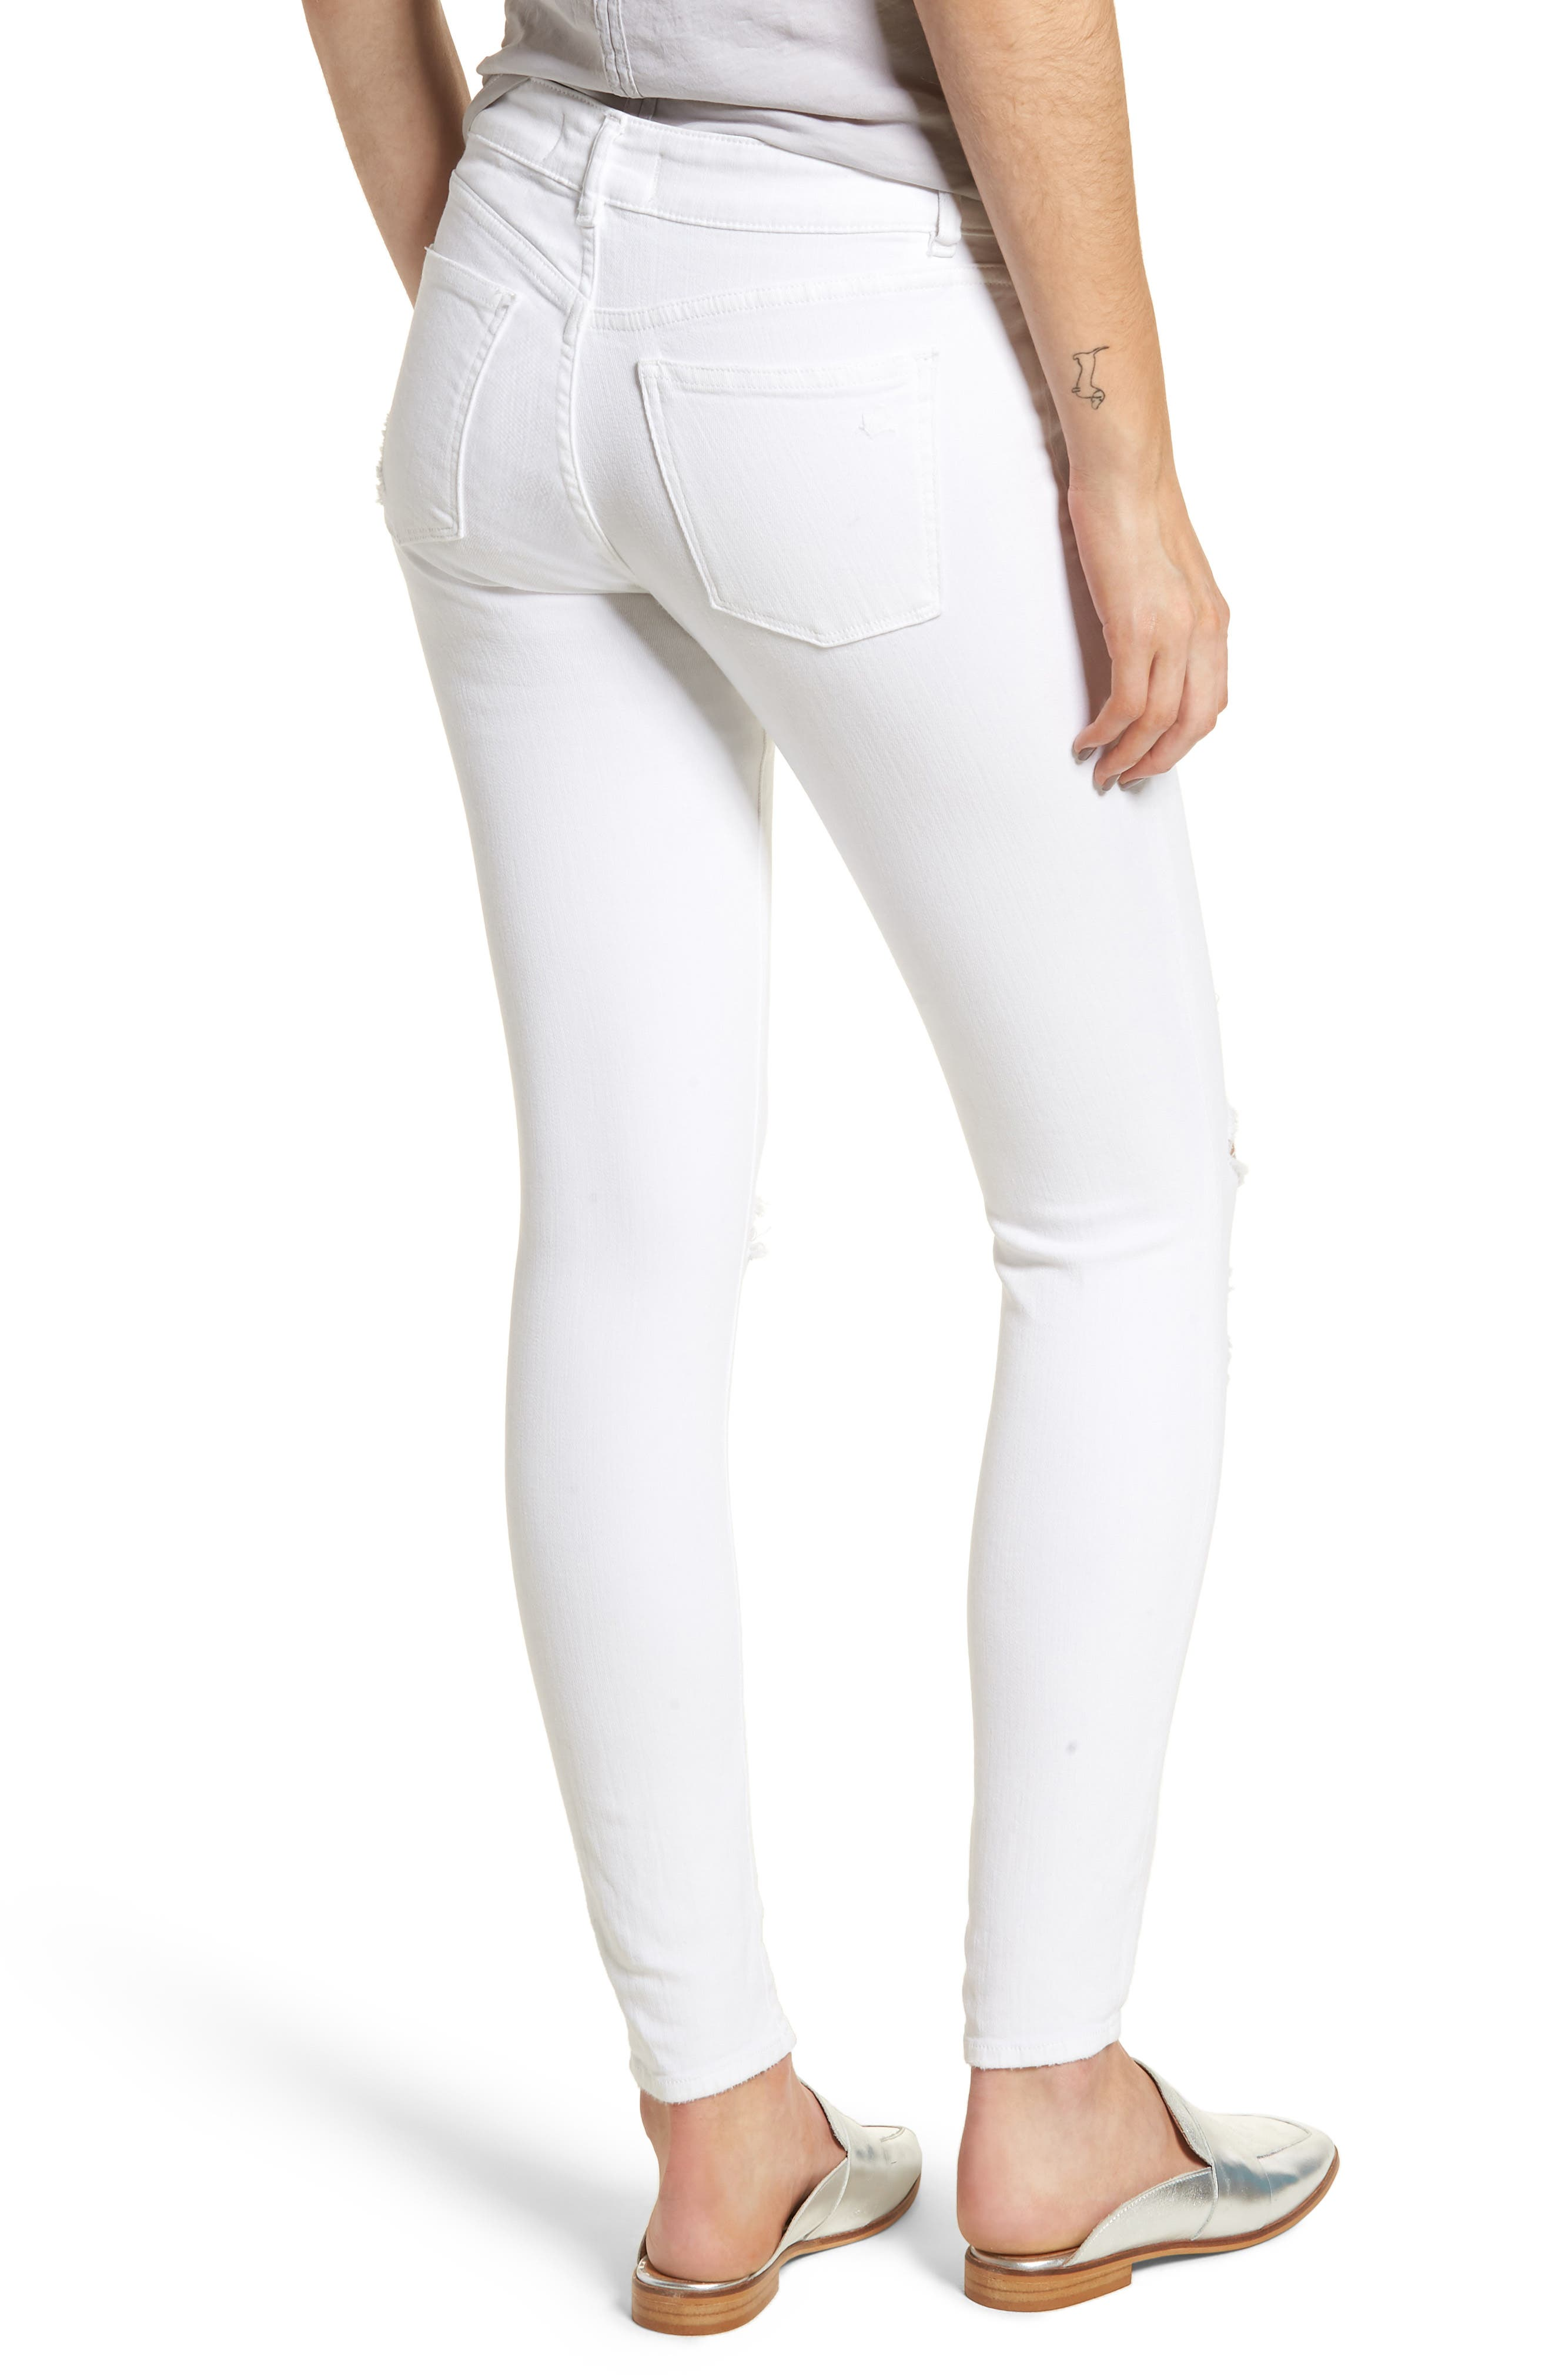 Emma Power Legging Jeans,                             Alternate thumbnail 2, color,                             Dawson